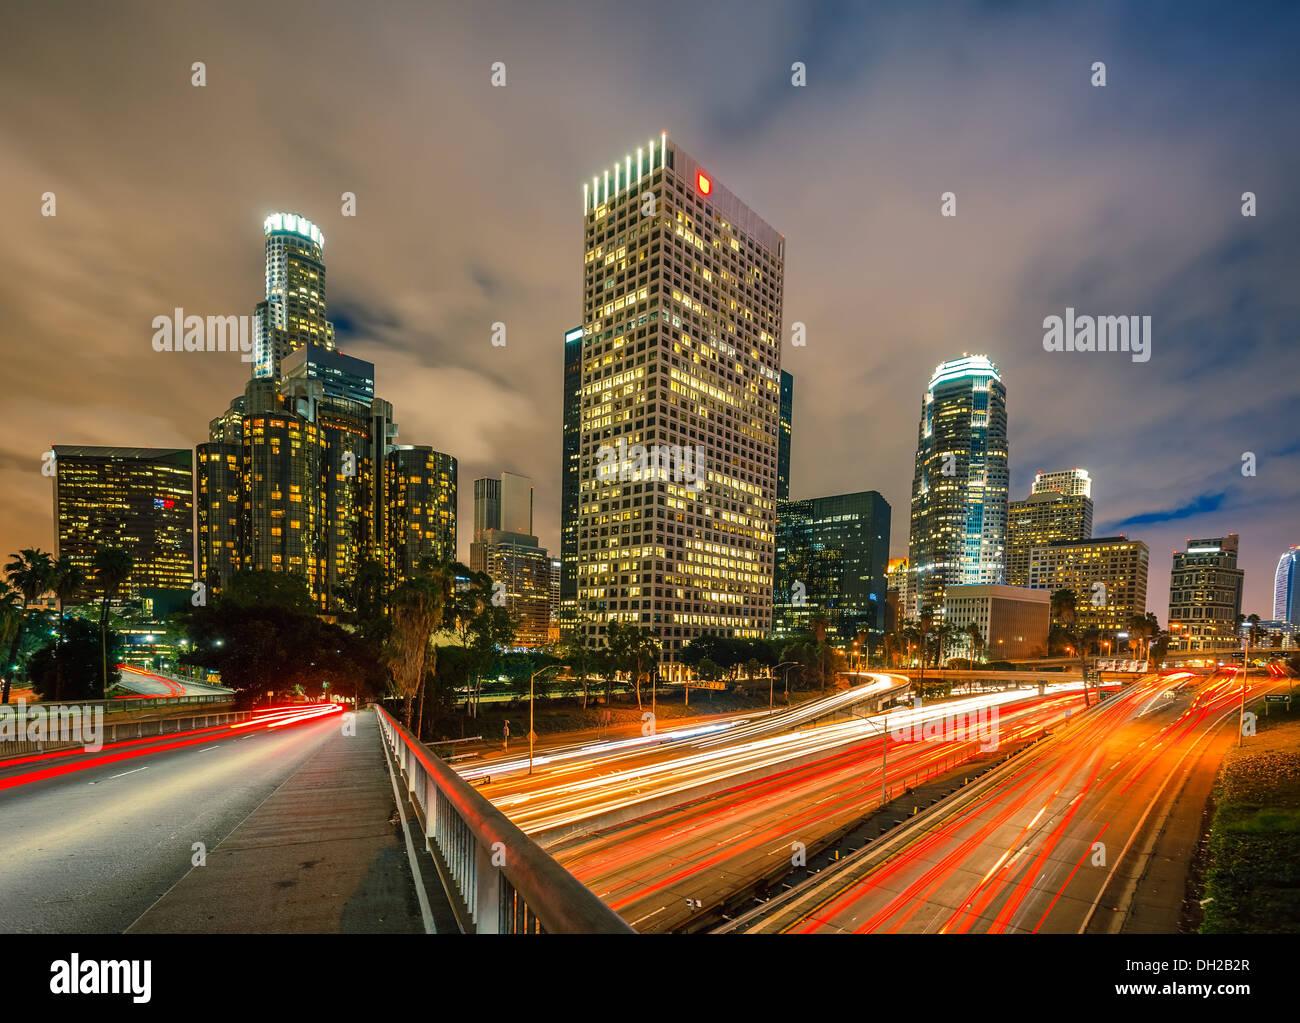 Los Angeles at night Photo Stock